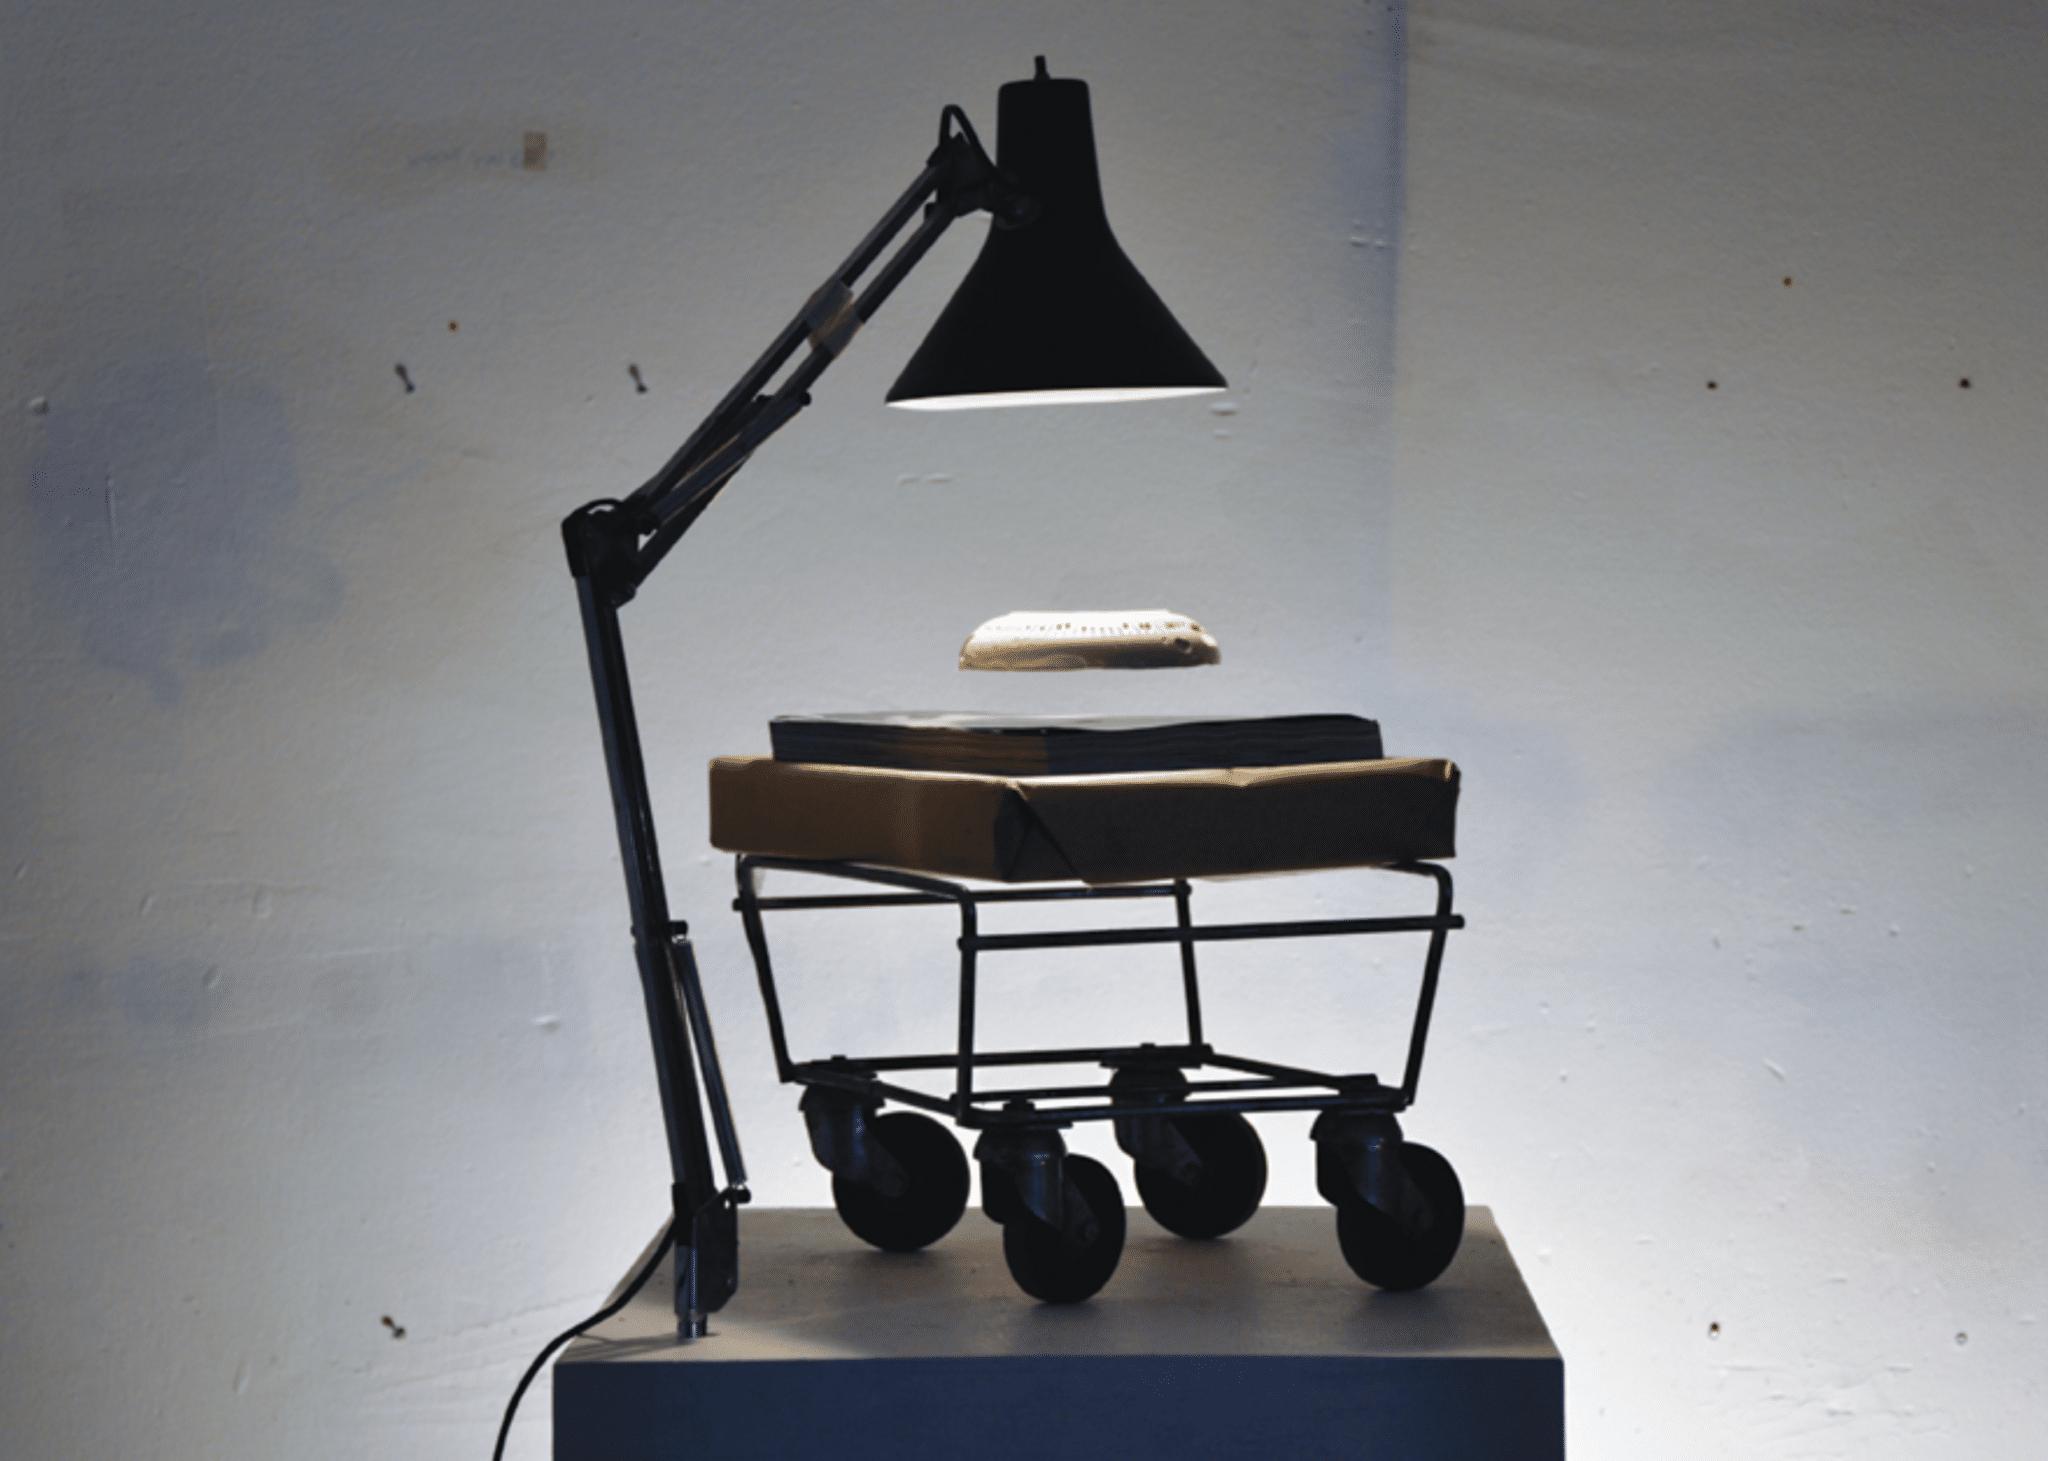 Floating art objects